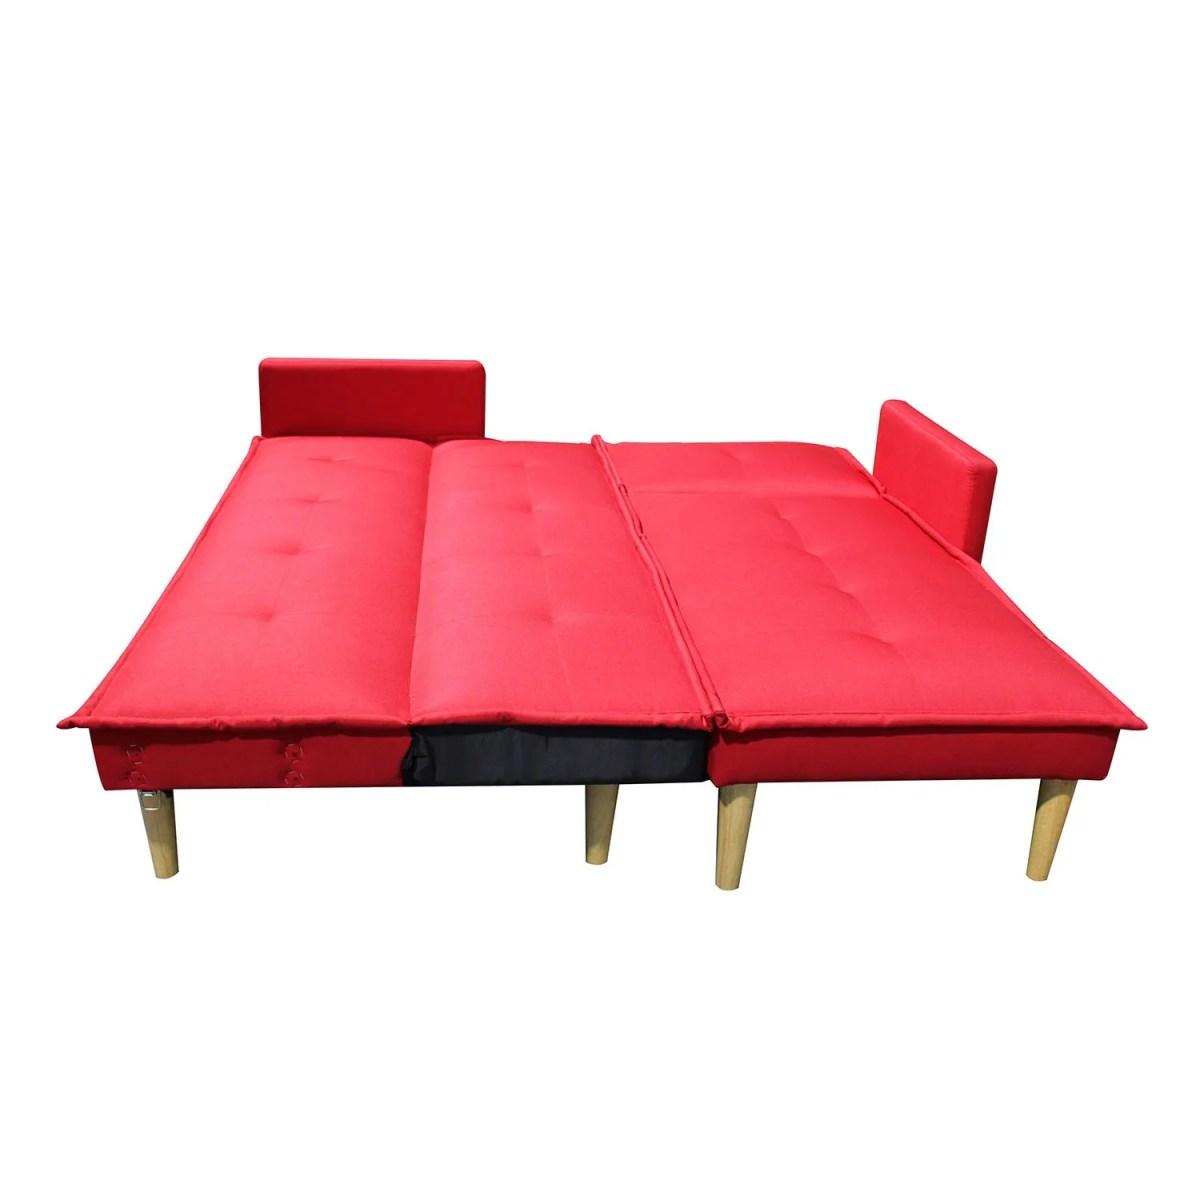 sala esquinada sofá cama independencia rojo 7